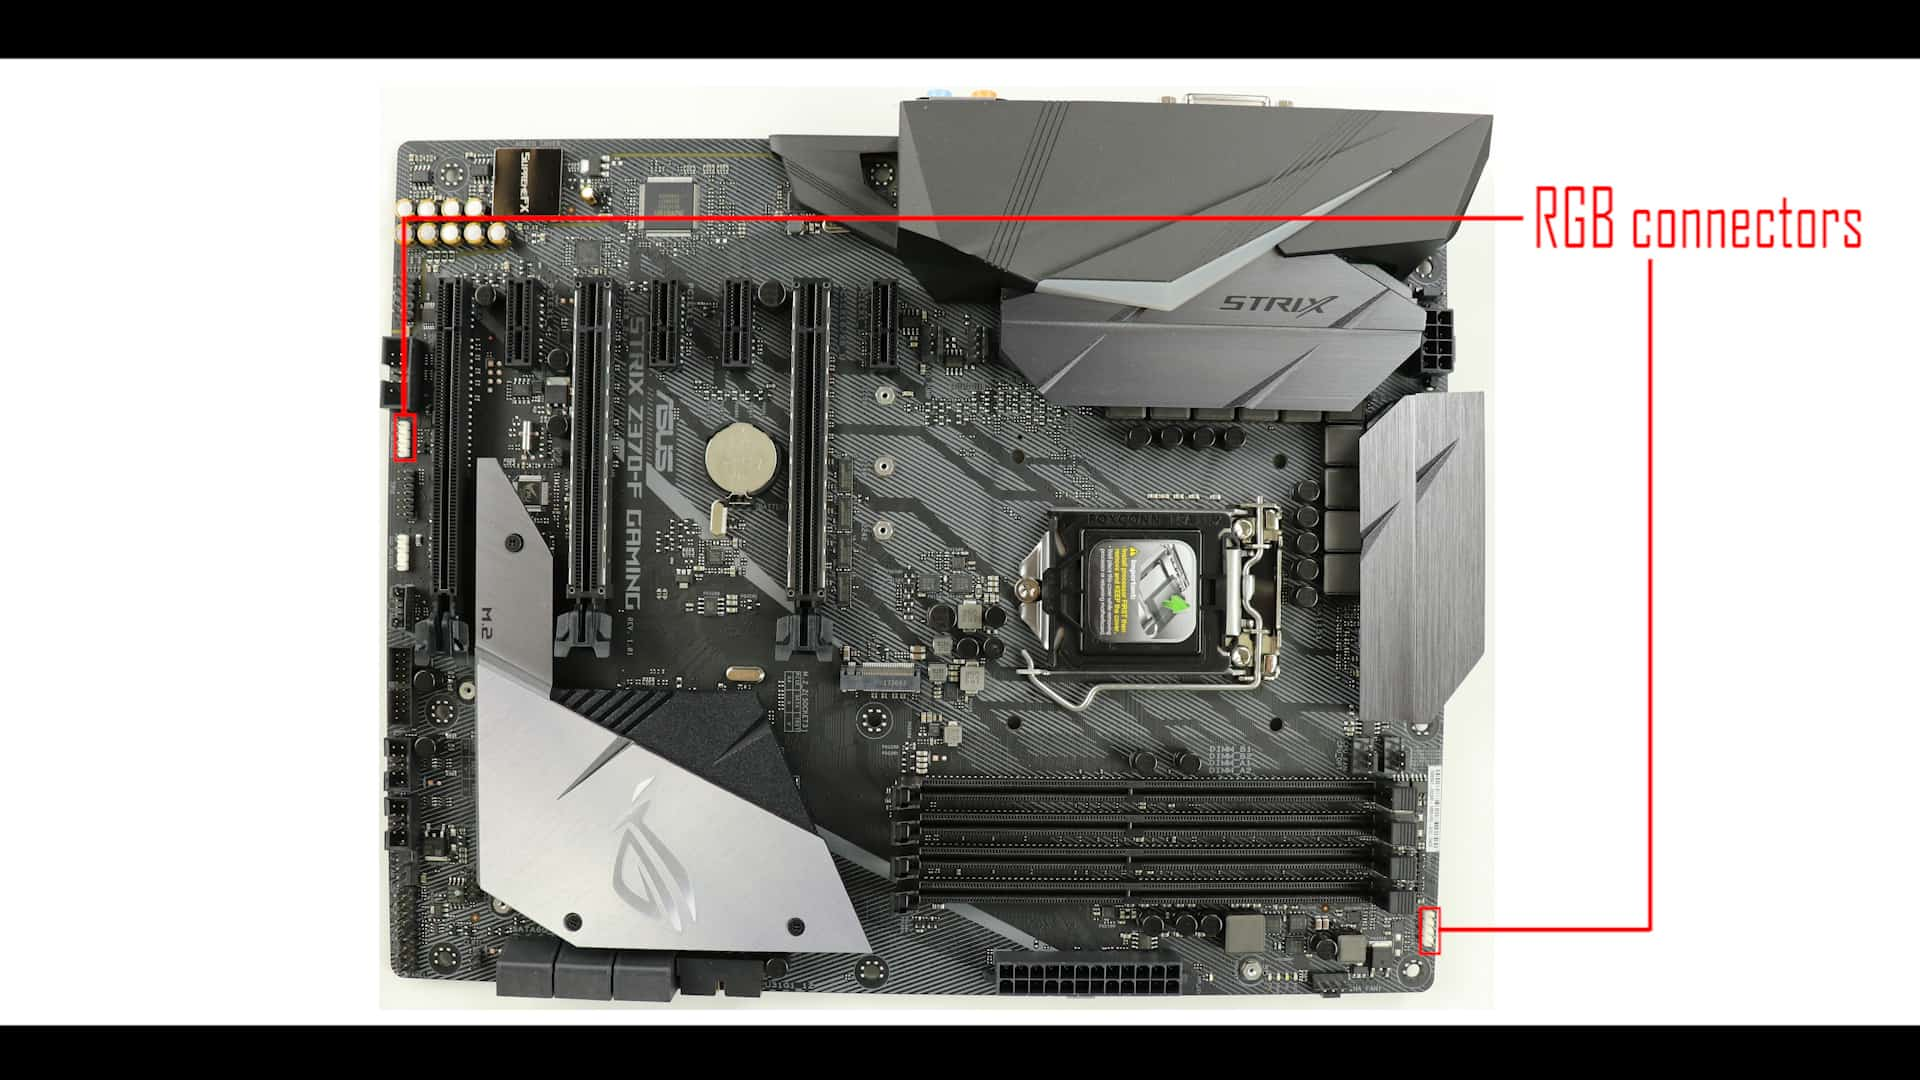 ROG STRIX Z370-F Gaming, RGB CONNECOTRS